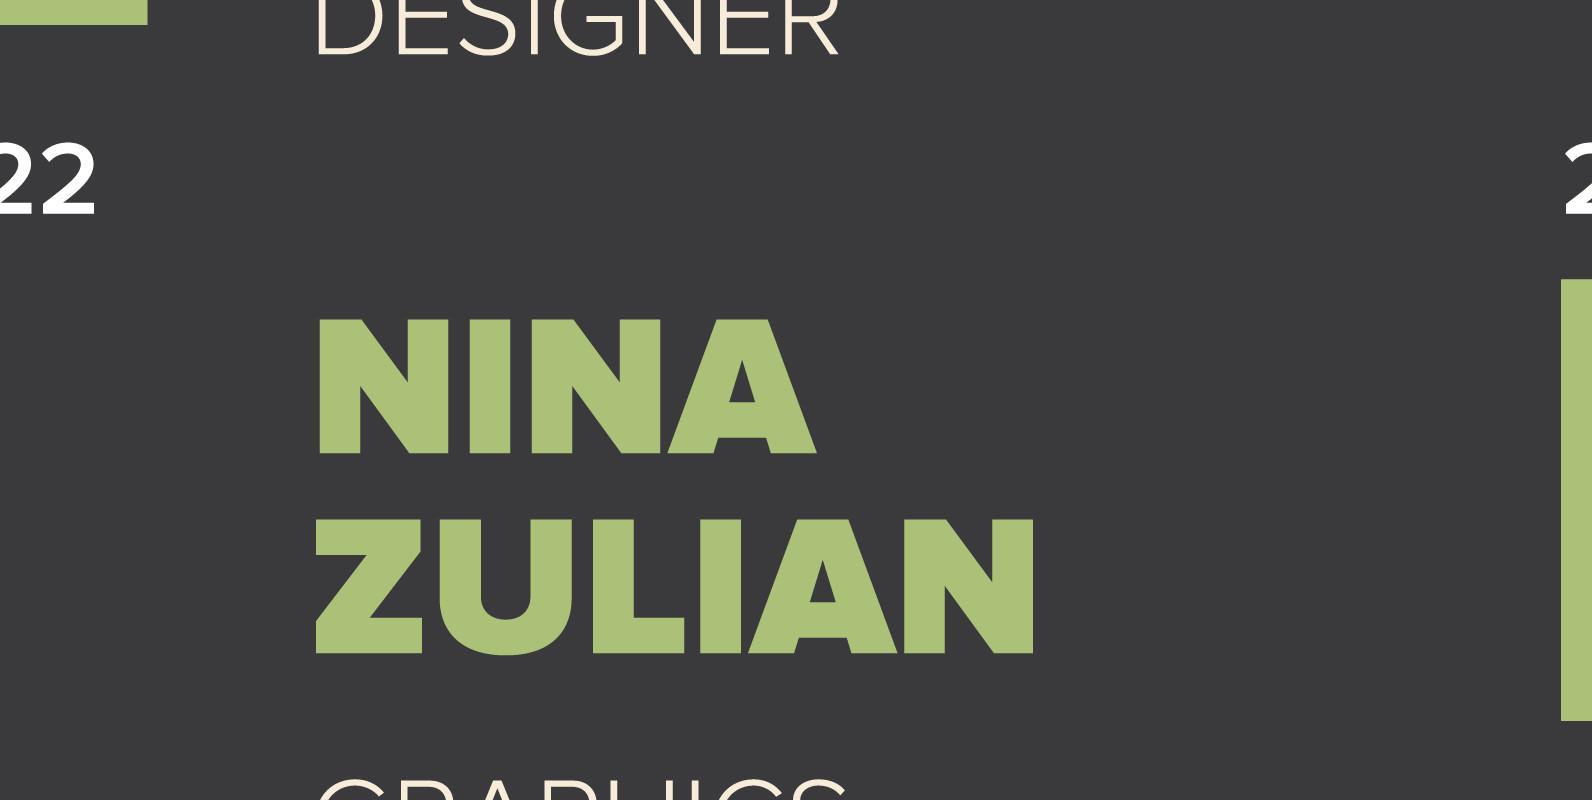 Nina Zulian